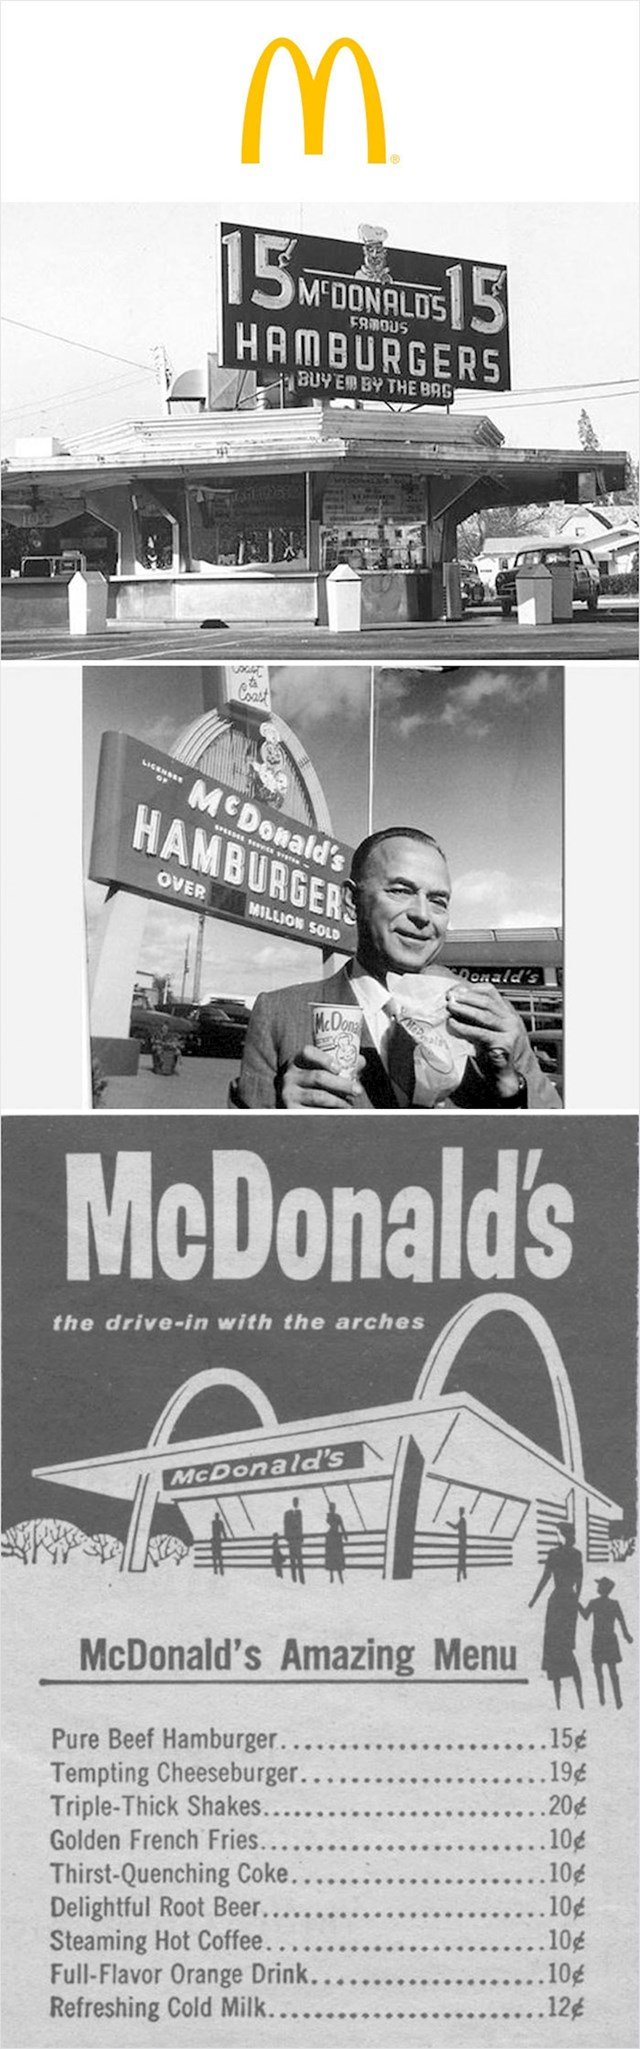 Prvi McDonald's (1955.)